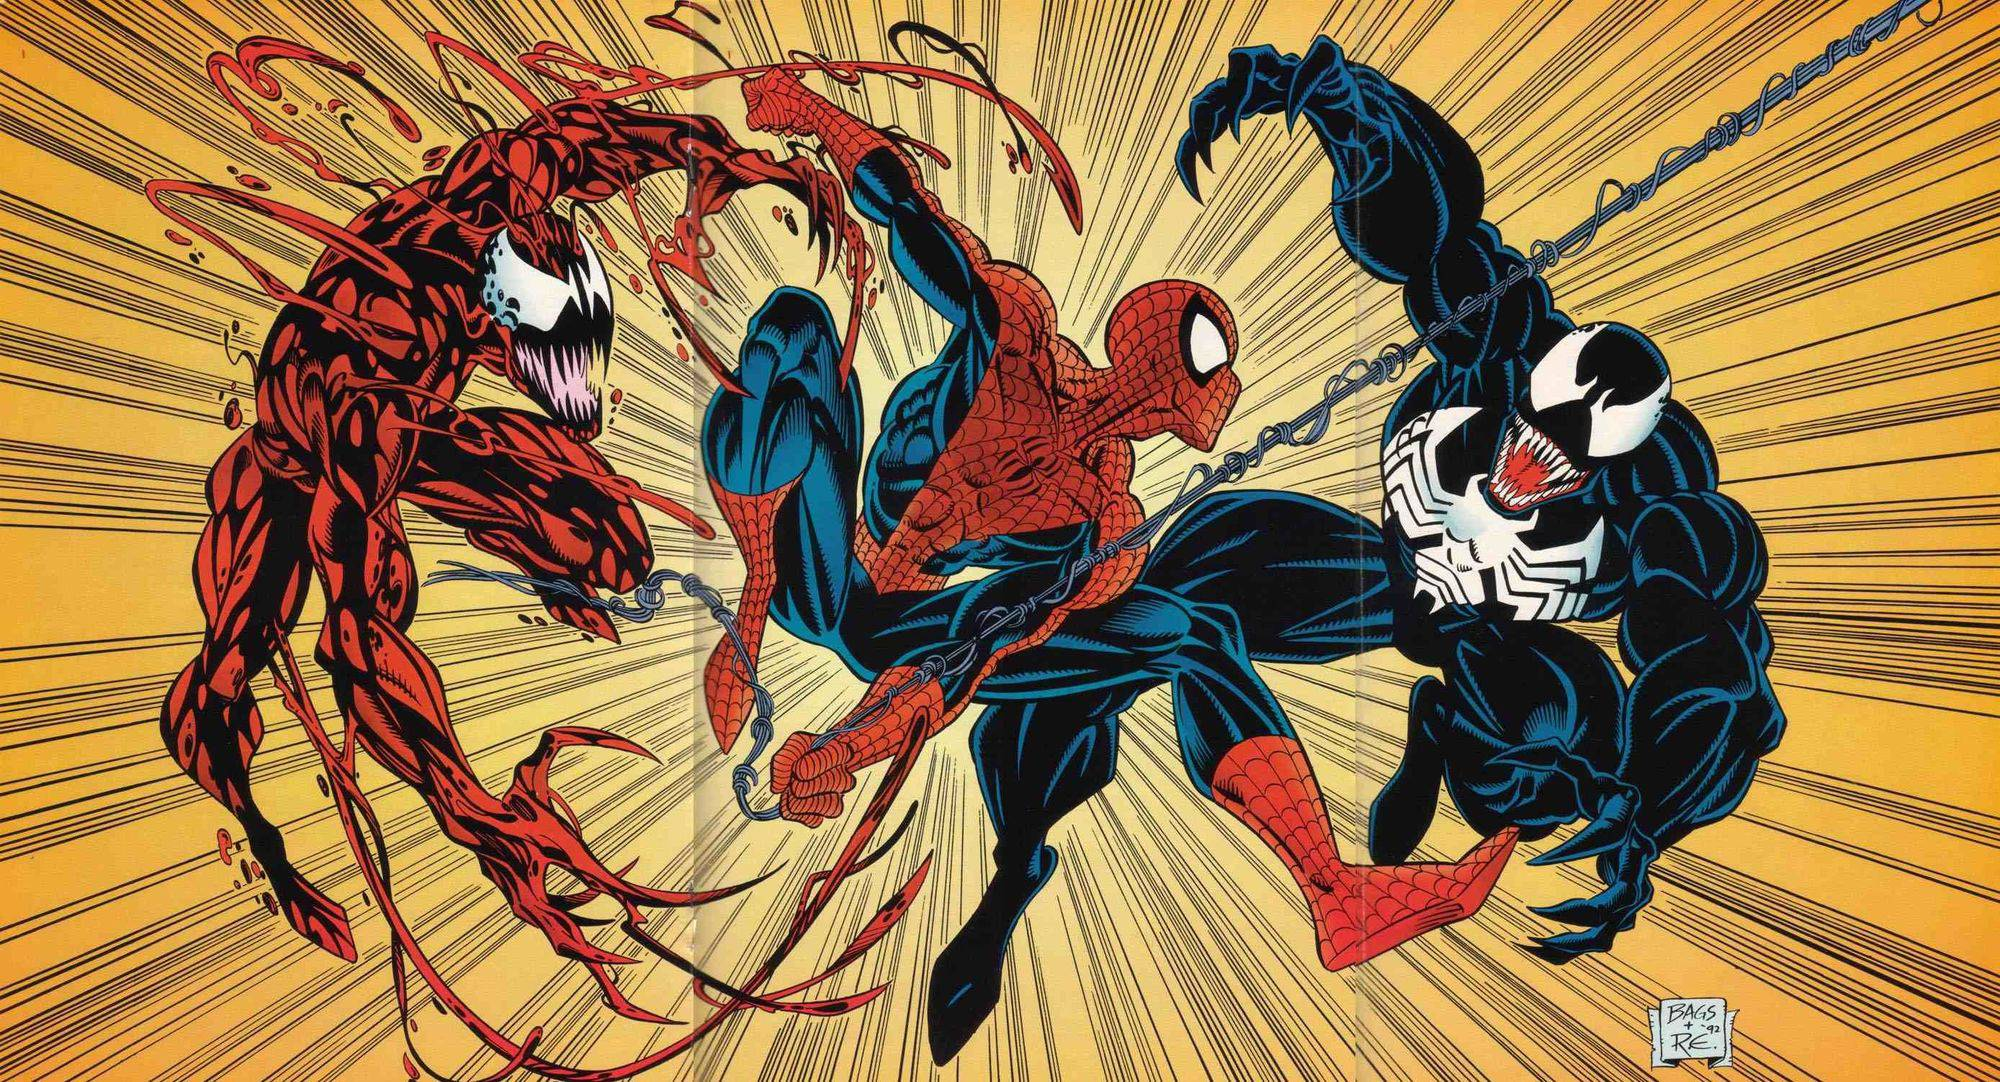 Amazing Spider-Man Vol 1 365 page 39-40 Maximum Carnage